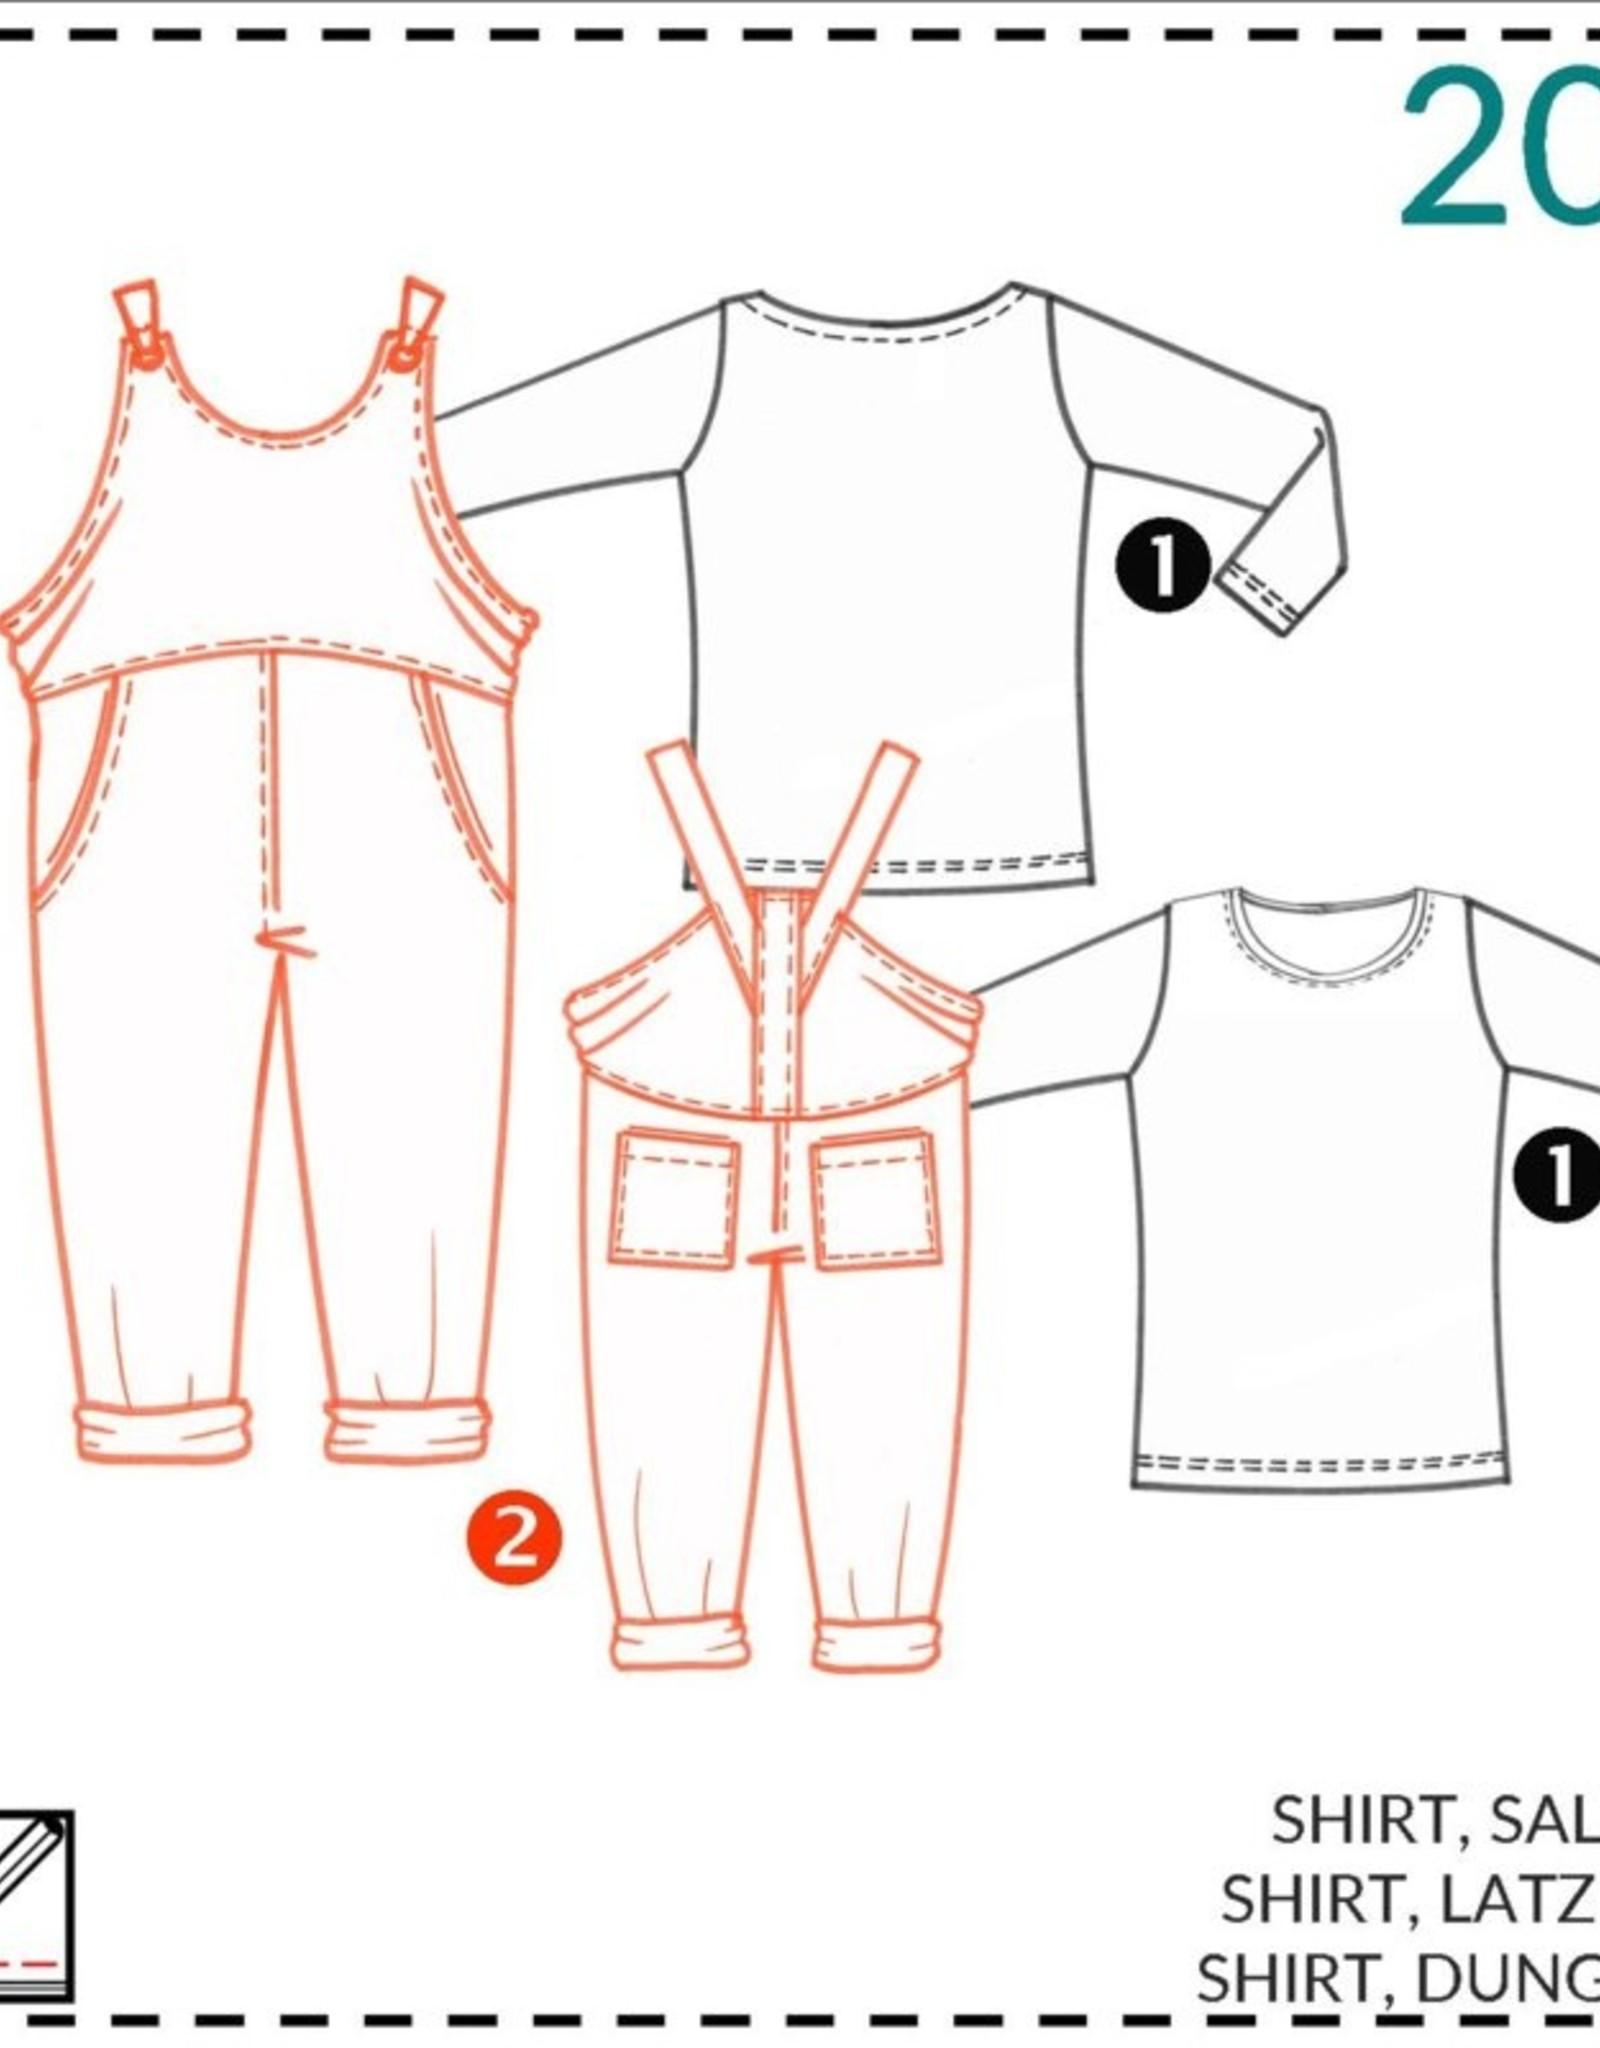 Abacadabra Shirt, salopet 200 - Abacadabra